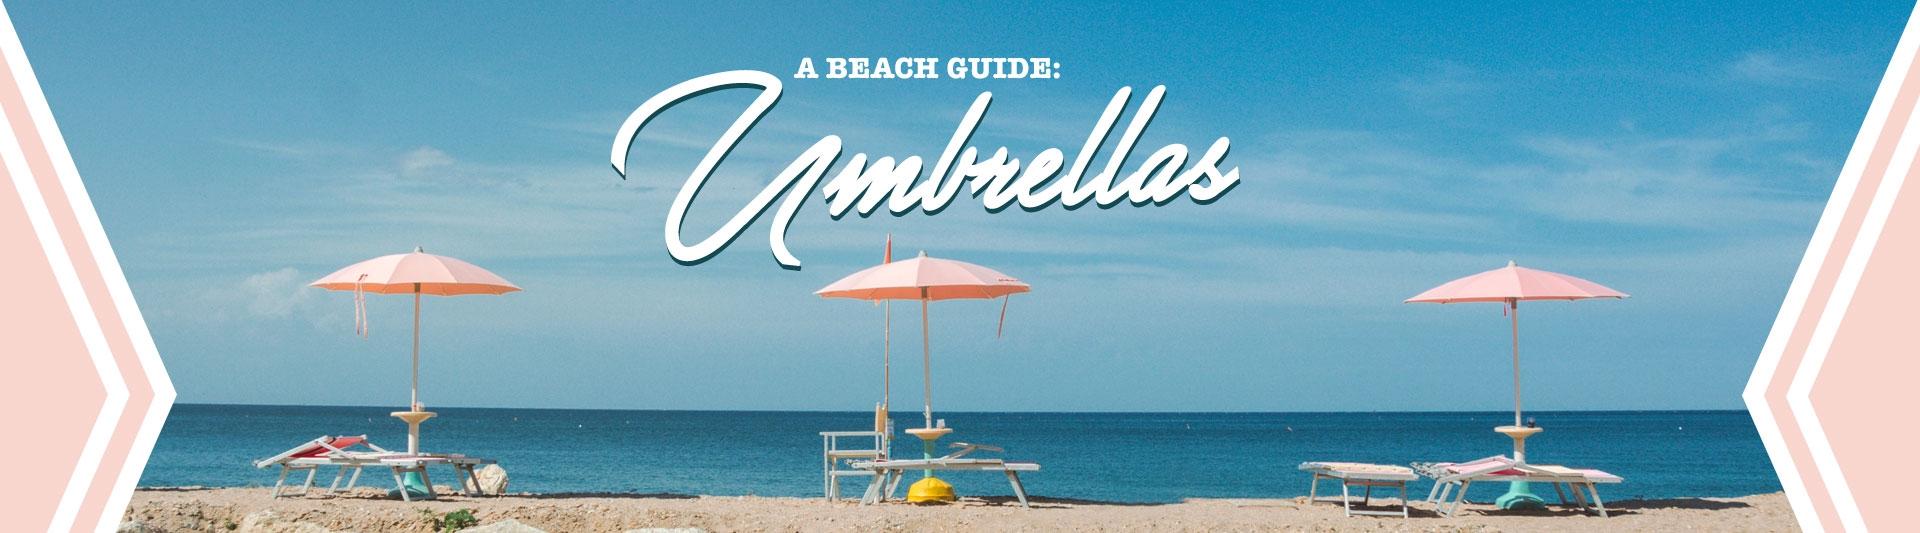 Beach umbrella banner